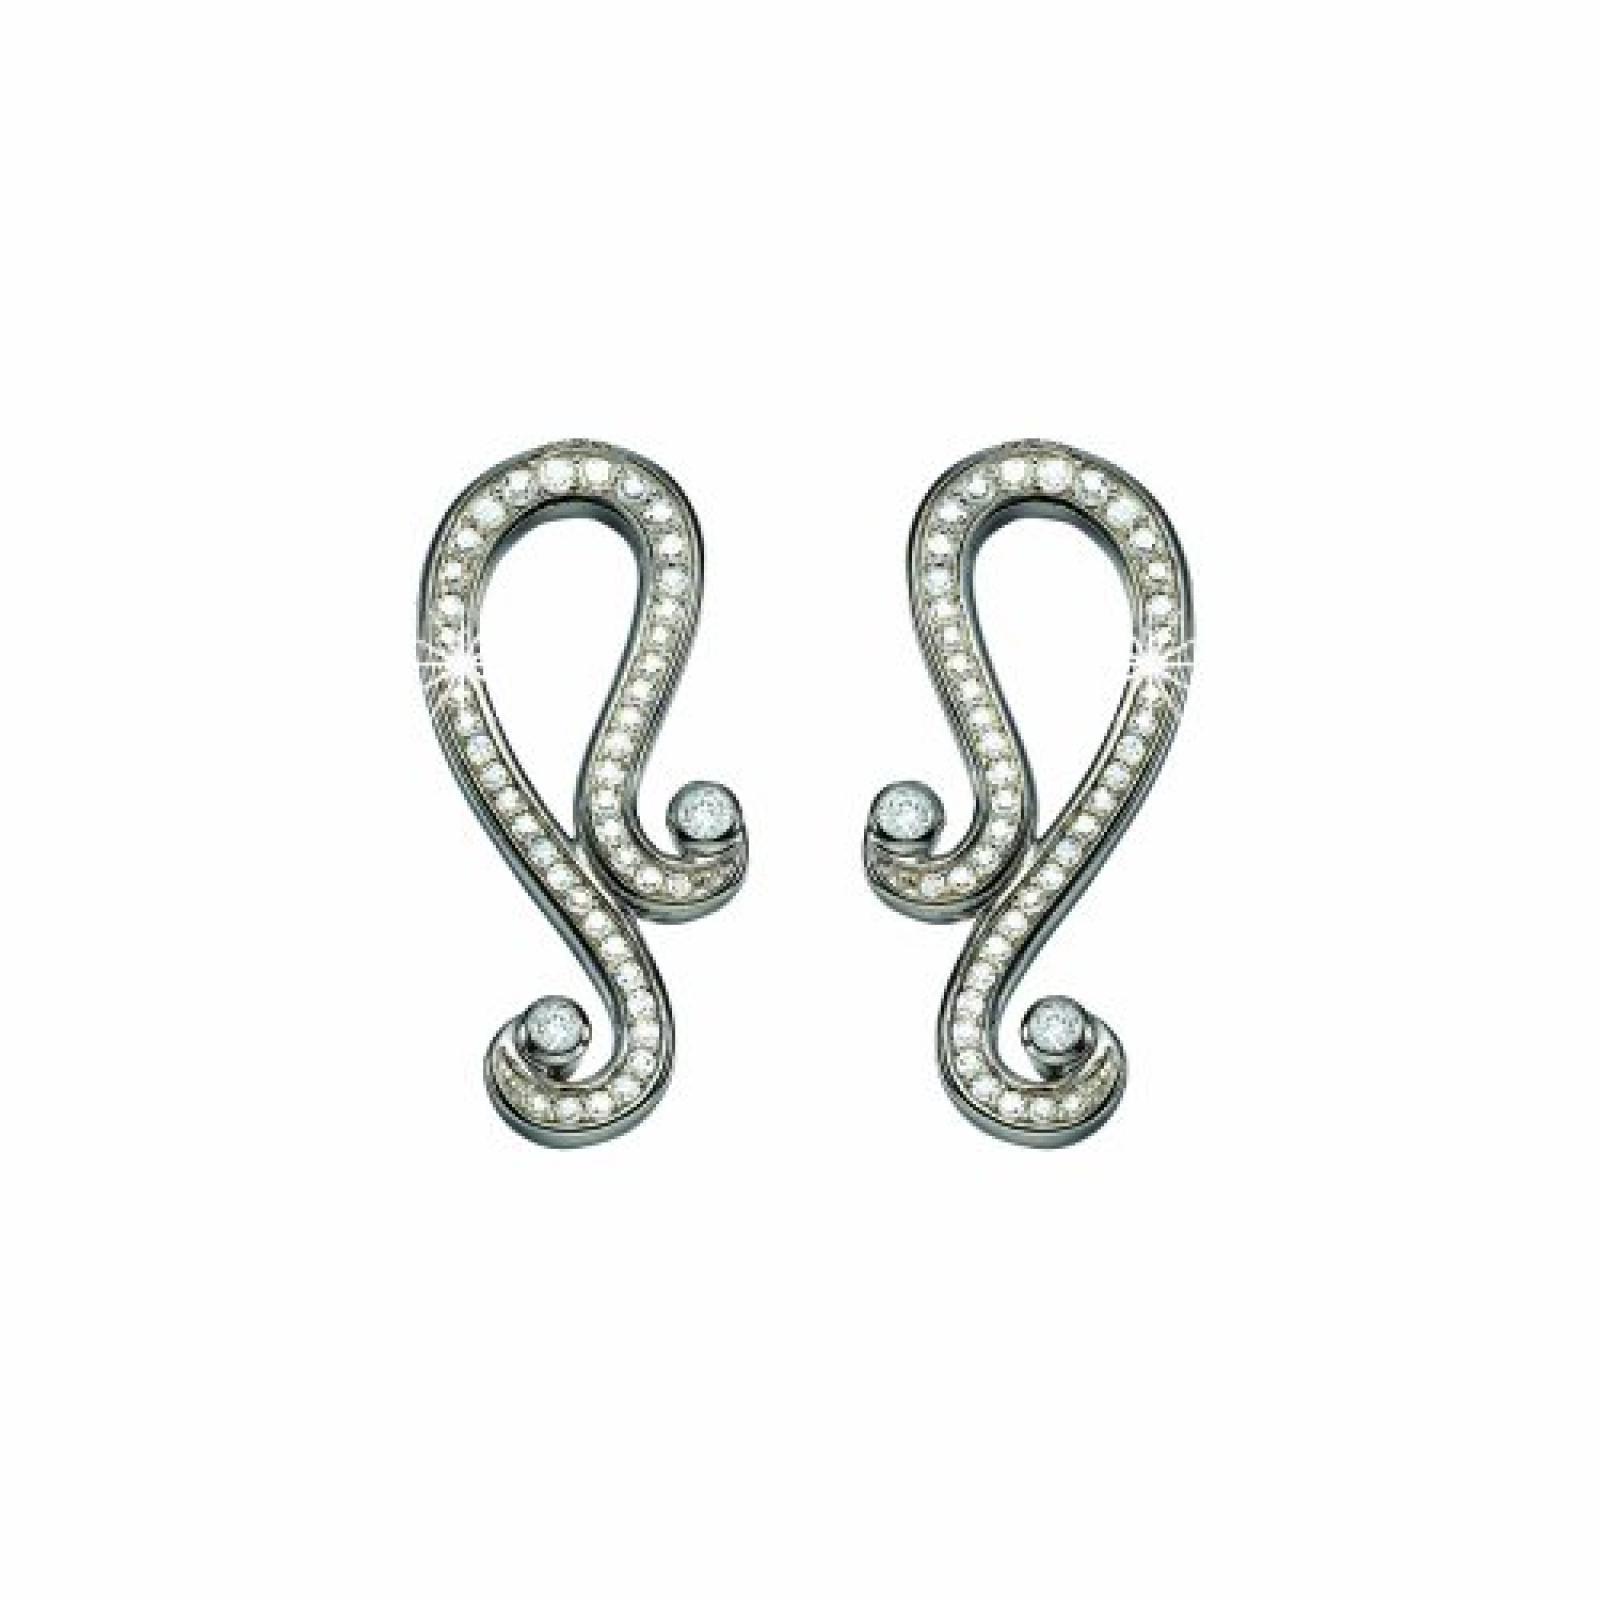 Pierre Cardin Damen-Ohrringe 925/ooo Sterlingsilber Charme Antique PCER-90168.A